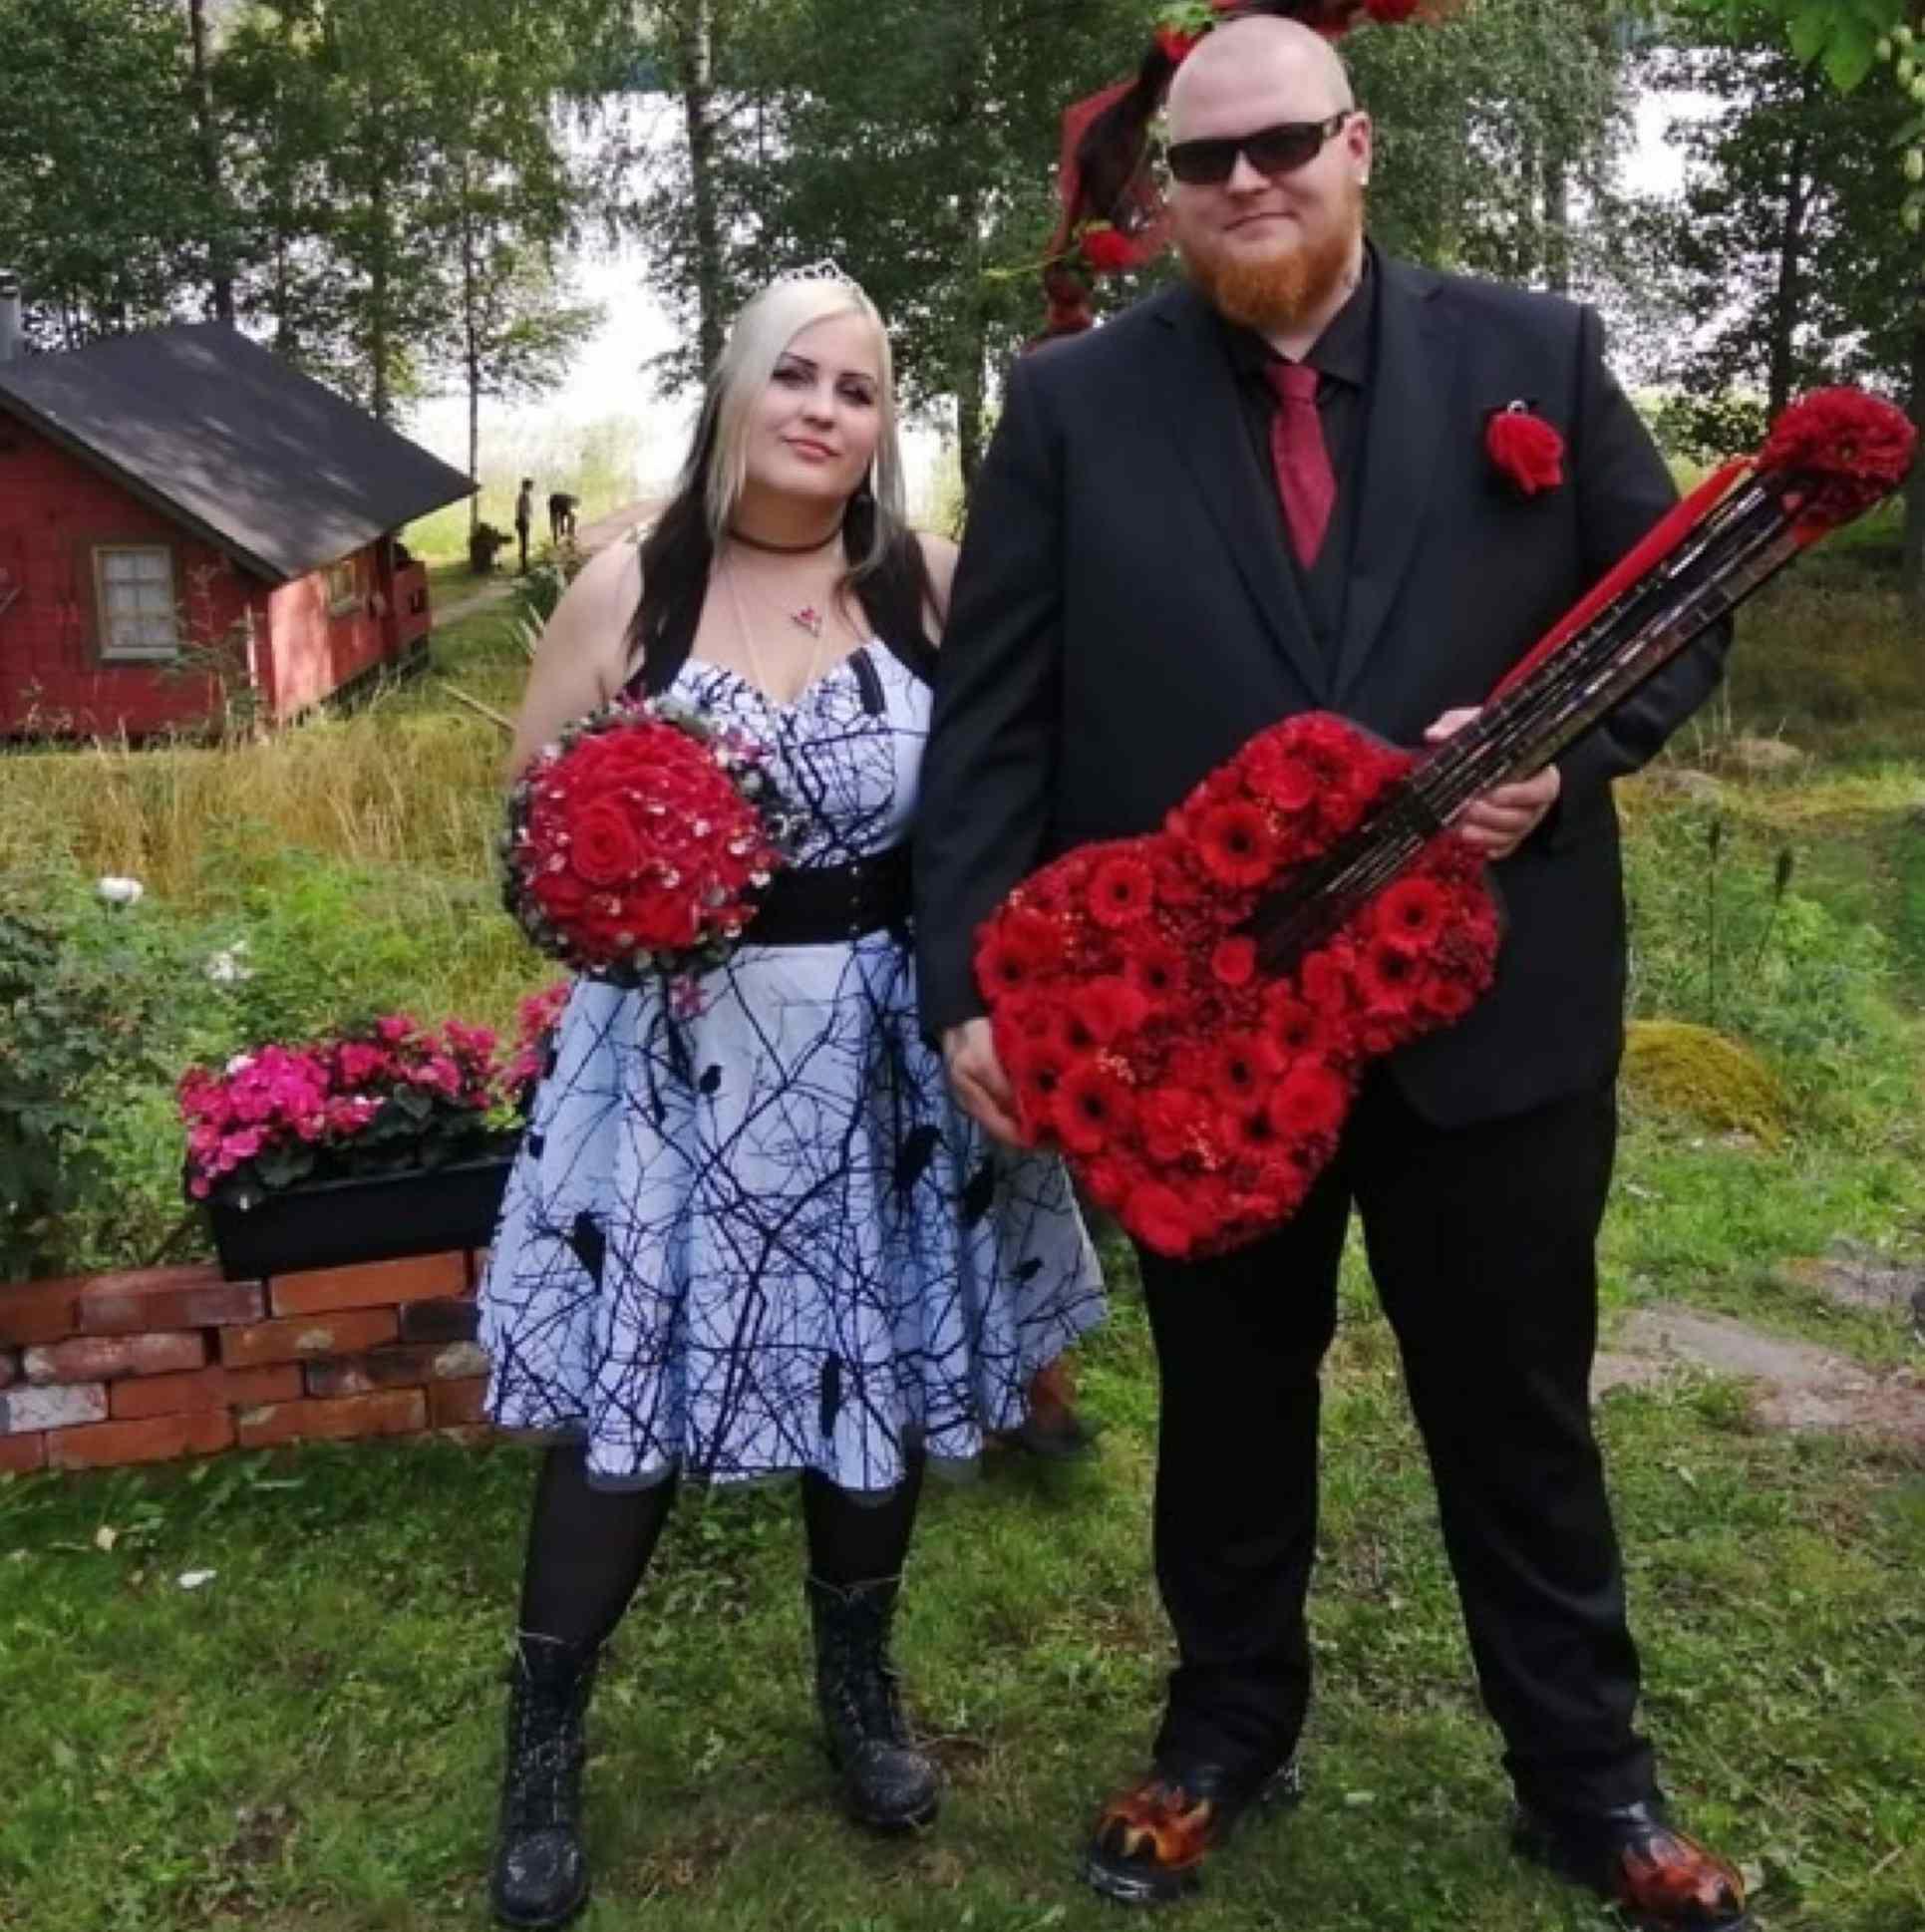 Rock-themed Wedding with Porta Nova roses